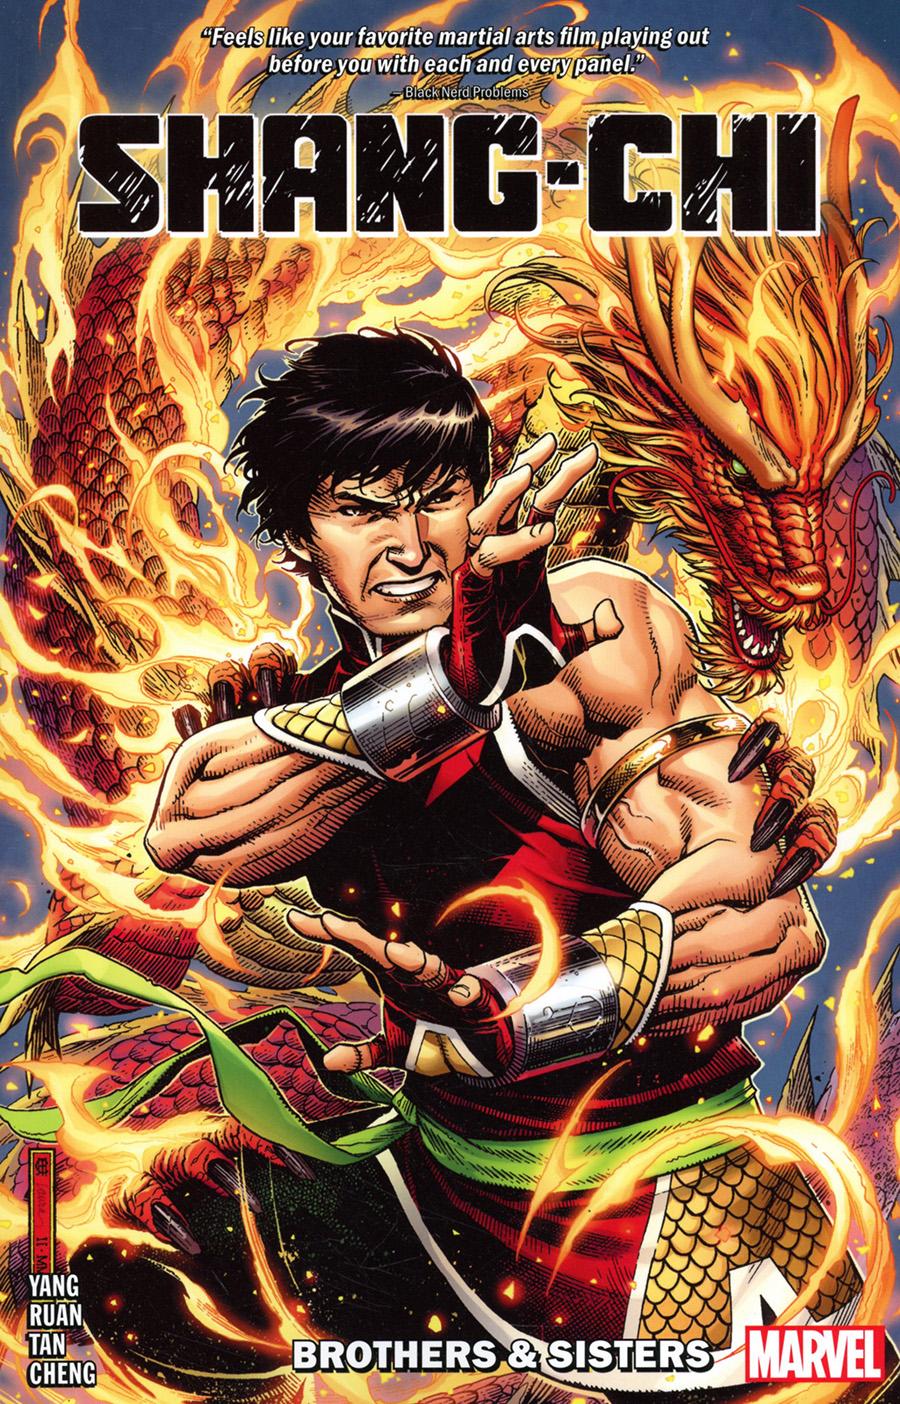 Shang-Chi By Gene Luen Yang Vol 1 Brothers & Sisters TP